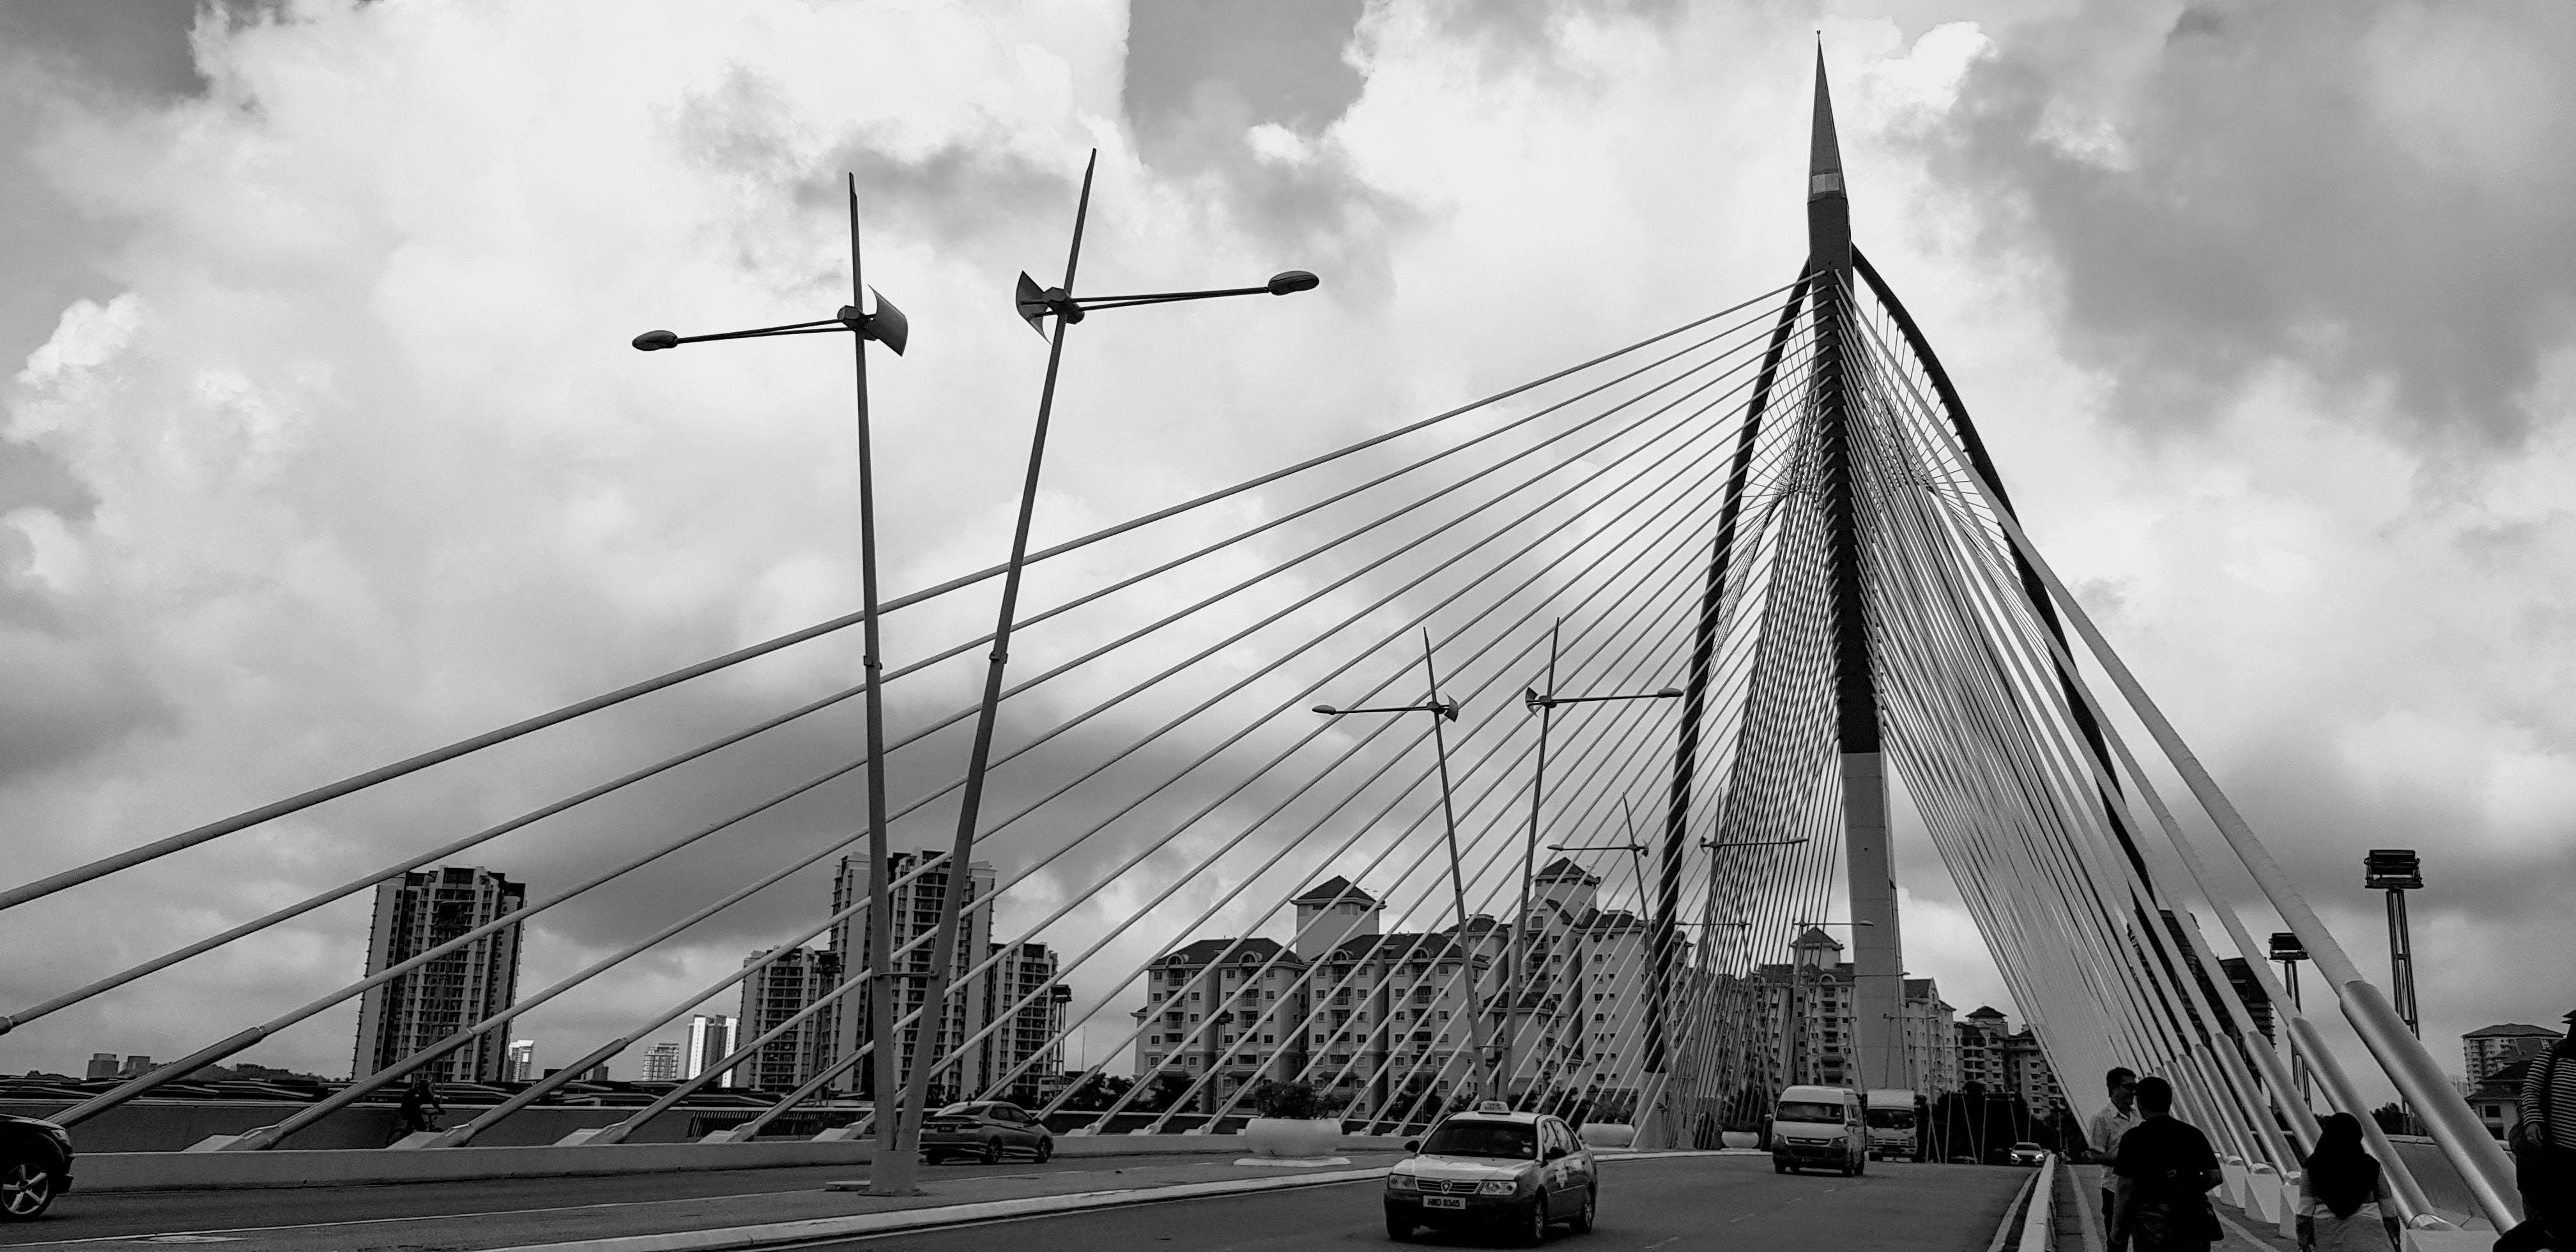 Grayscale Photo of Cable Bridge